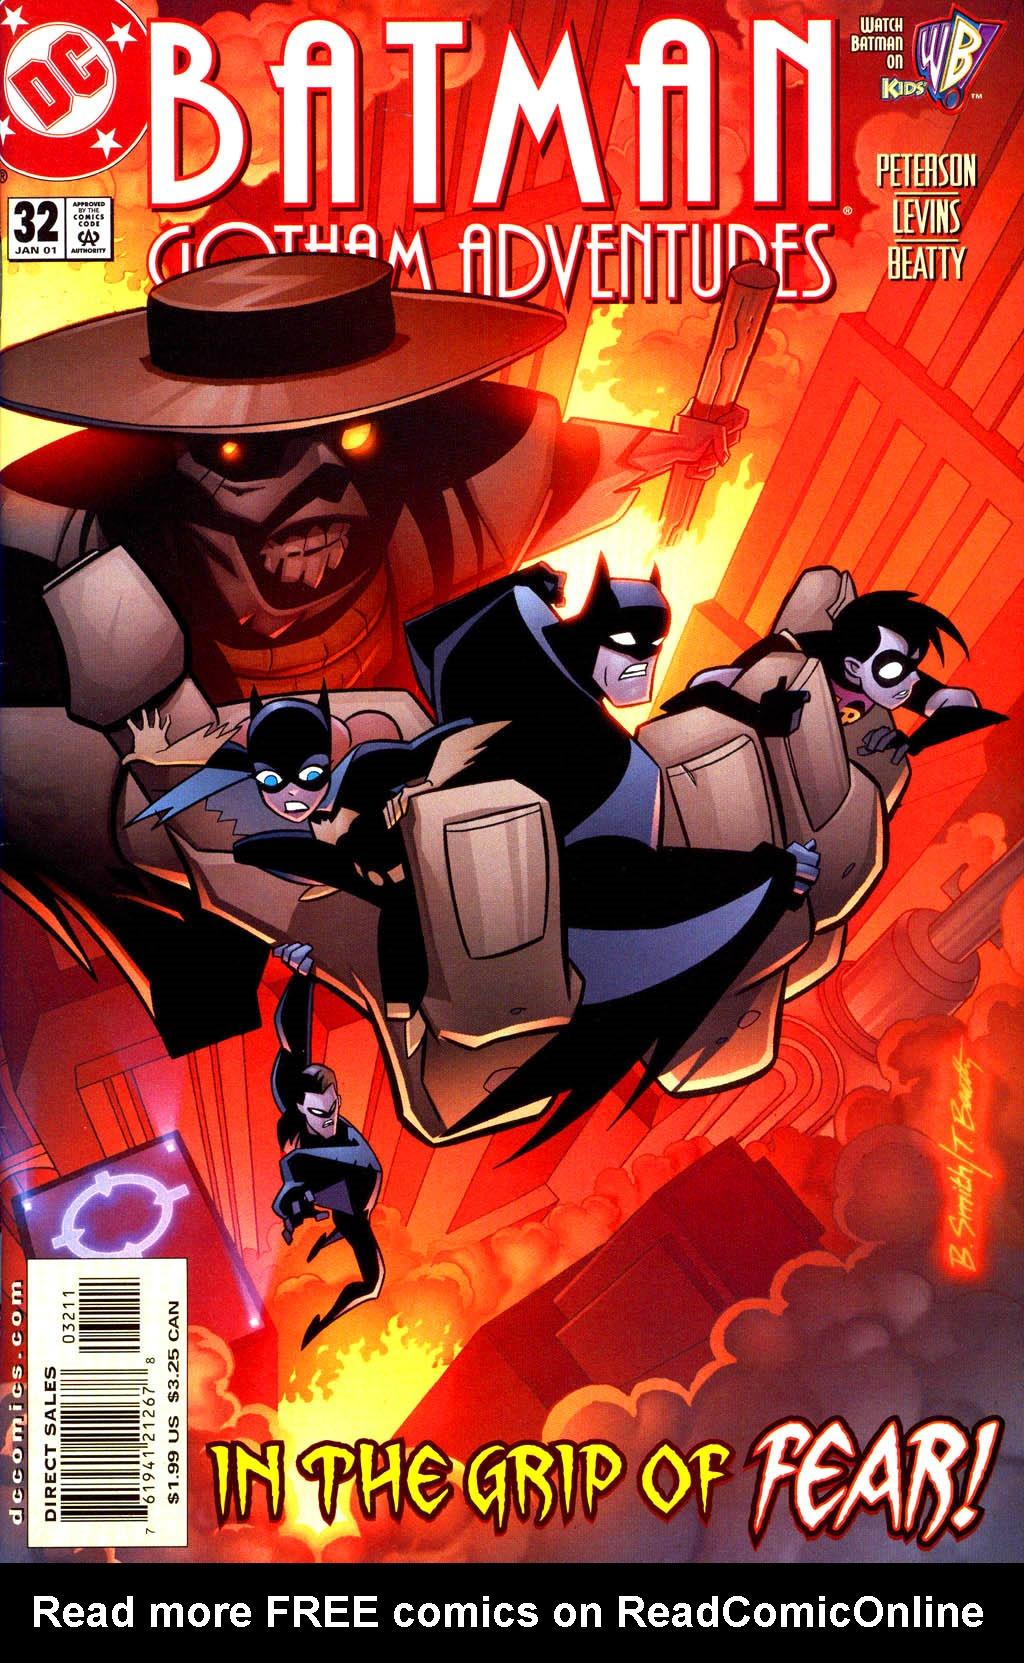 Batman: Gotham Adventures 32 Page 1